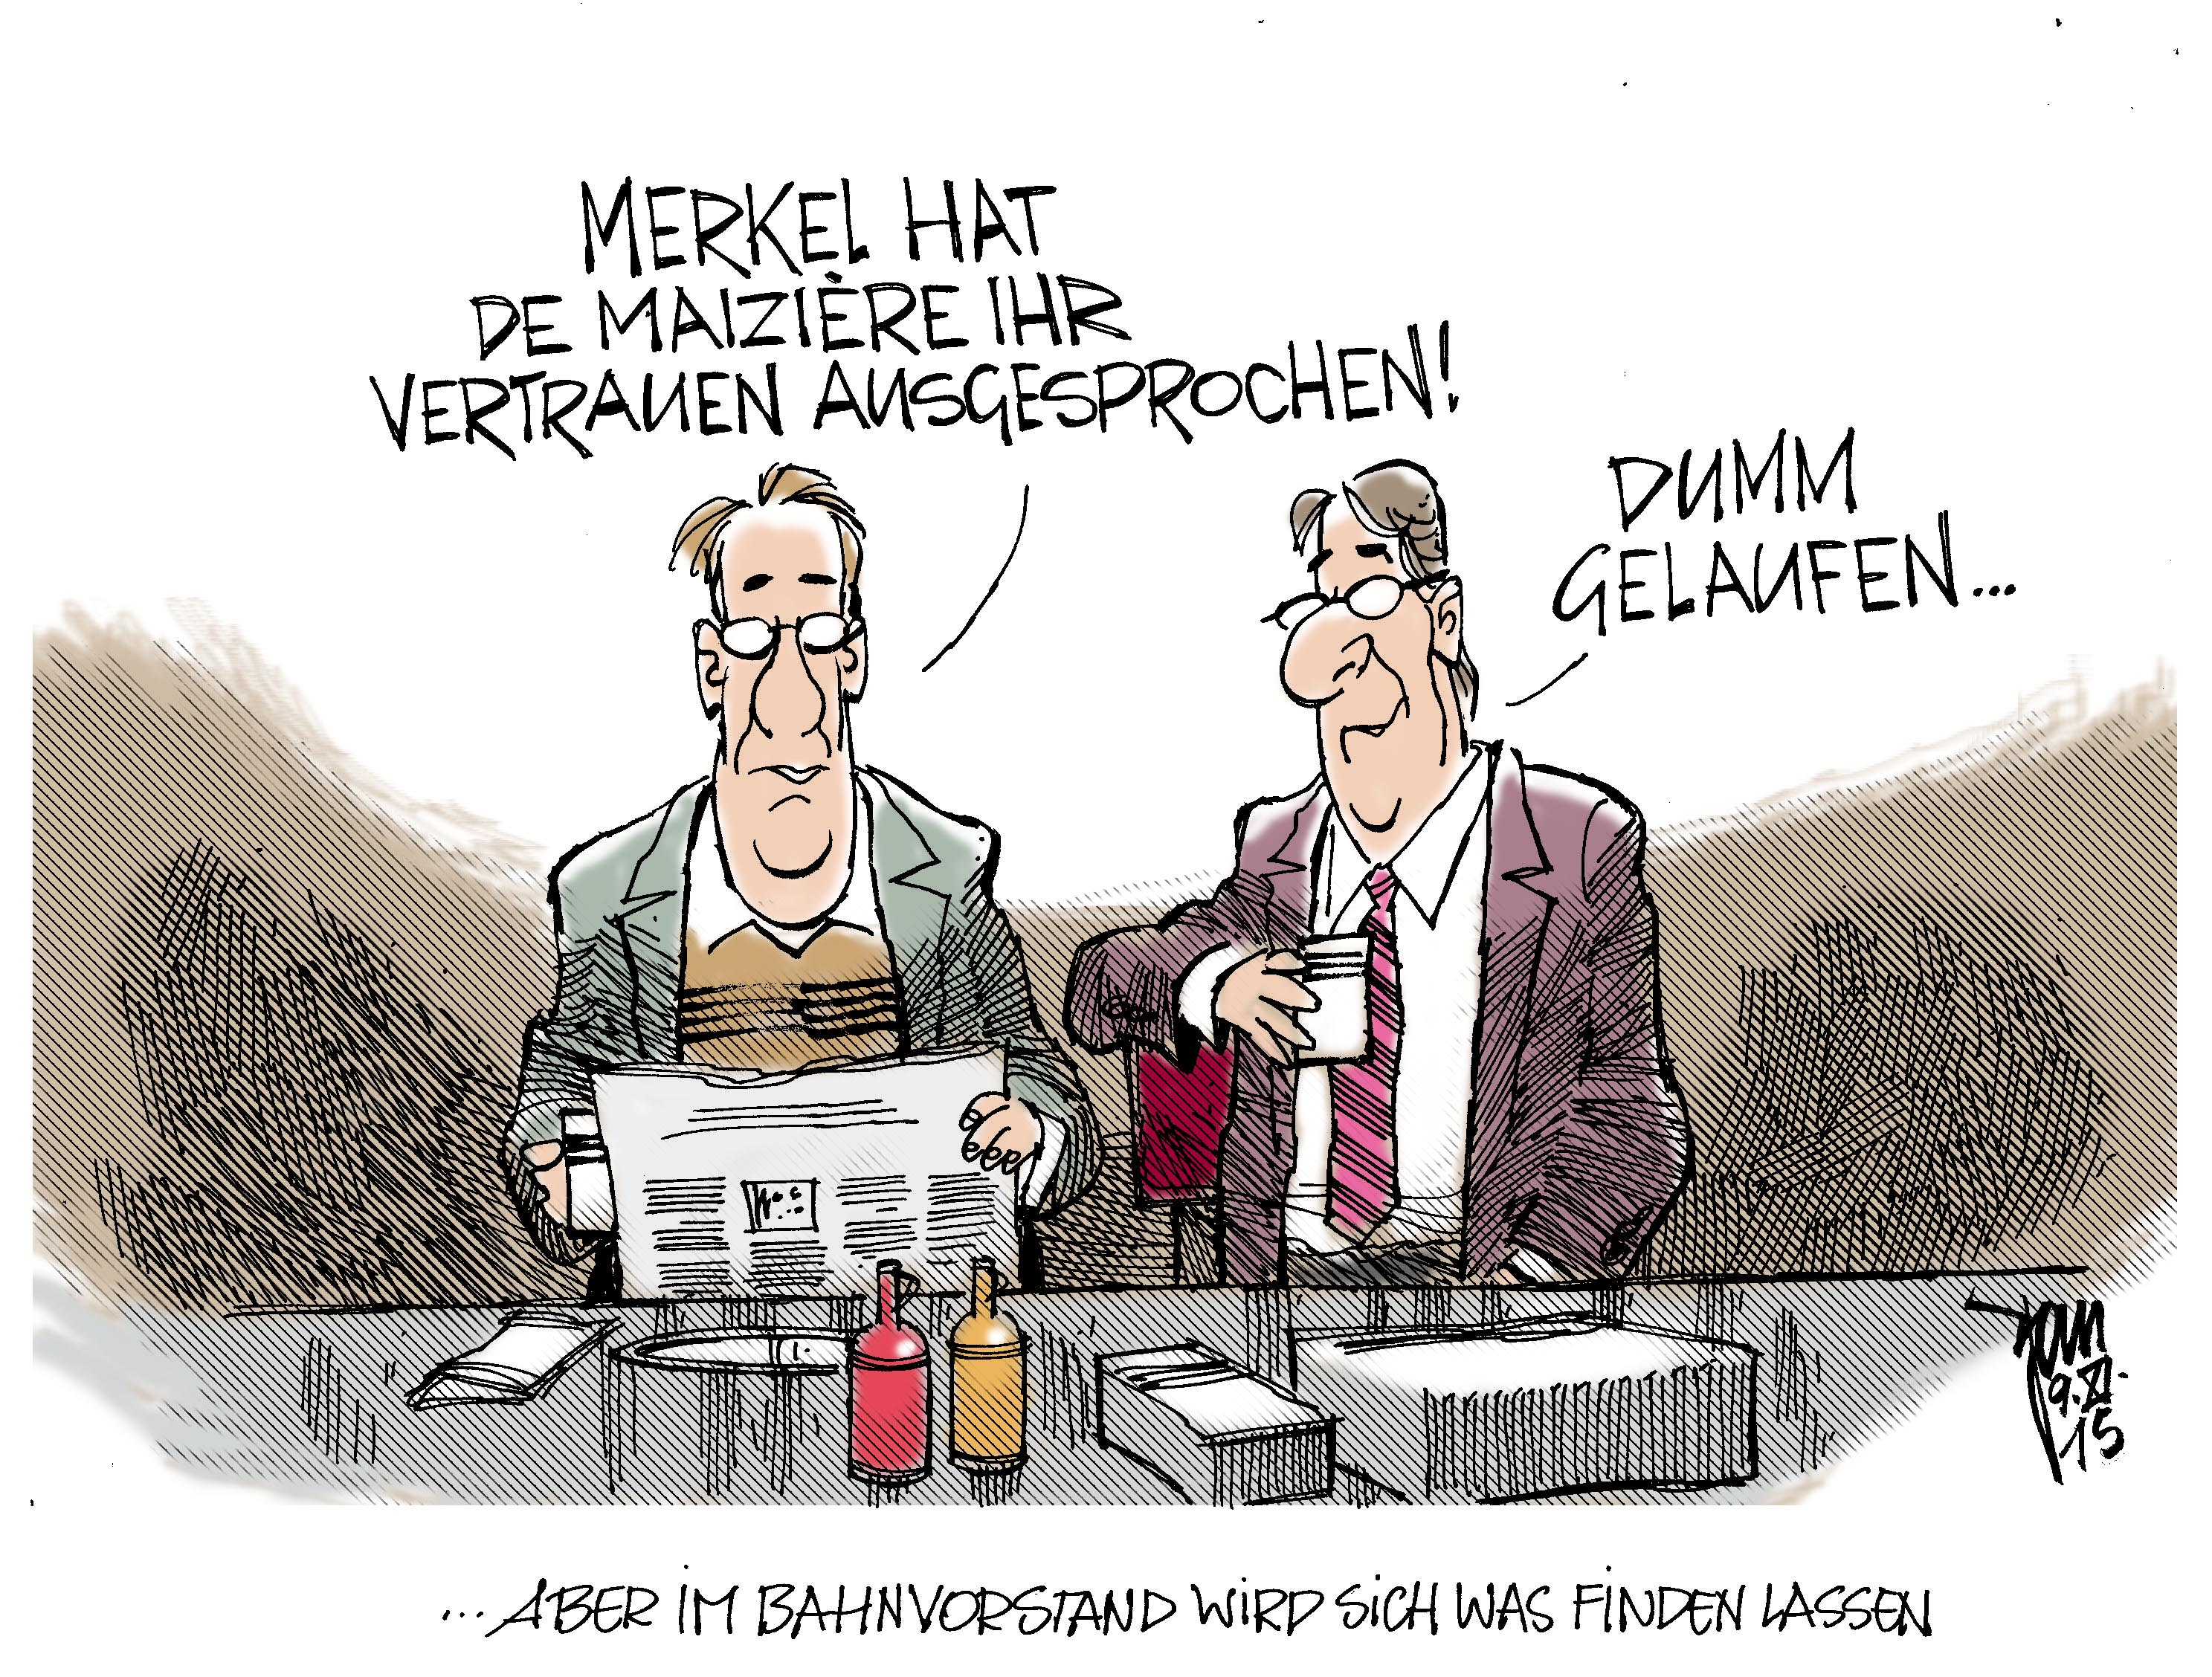 Merkel özil